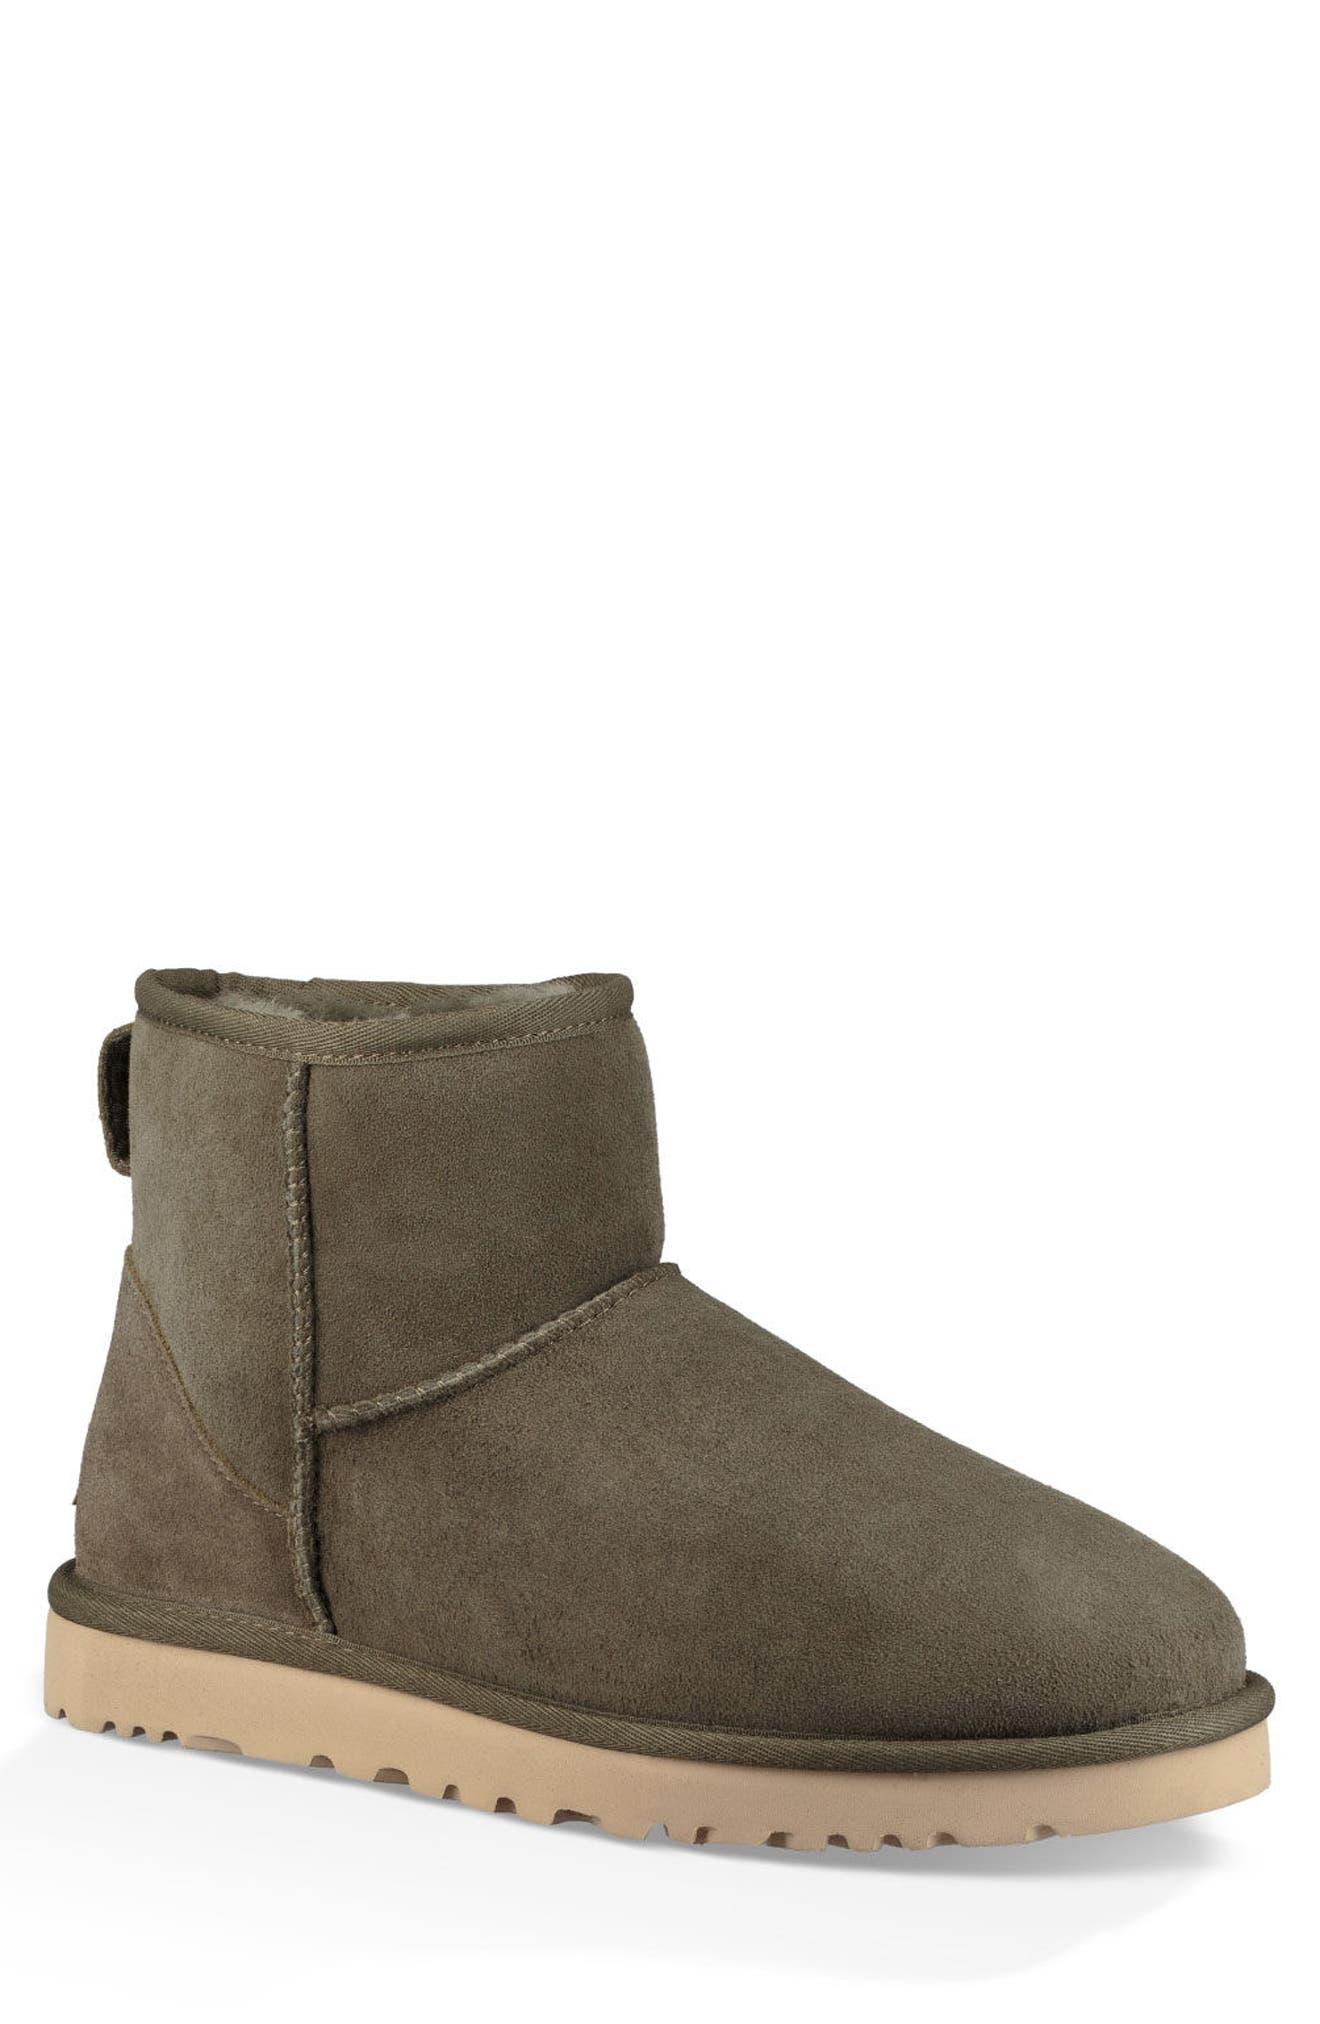 Ugg Classic Mini Boot, Green